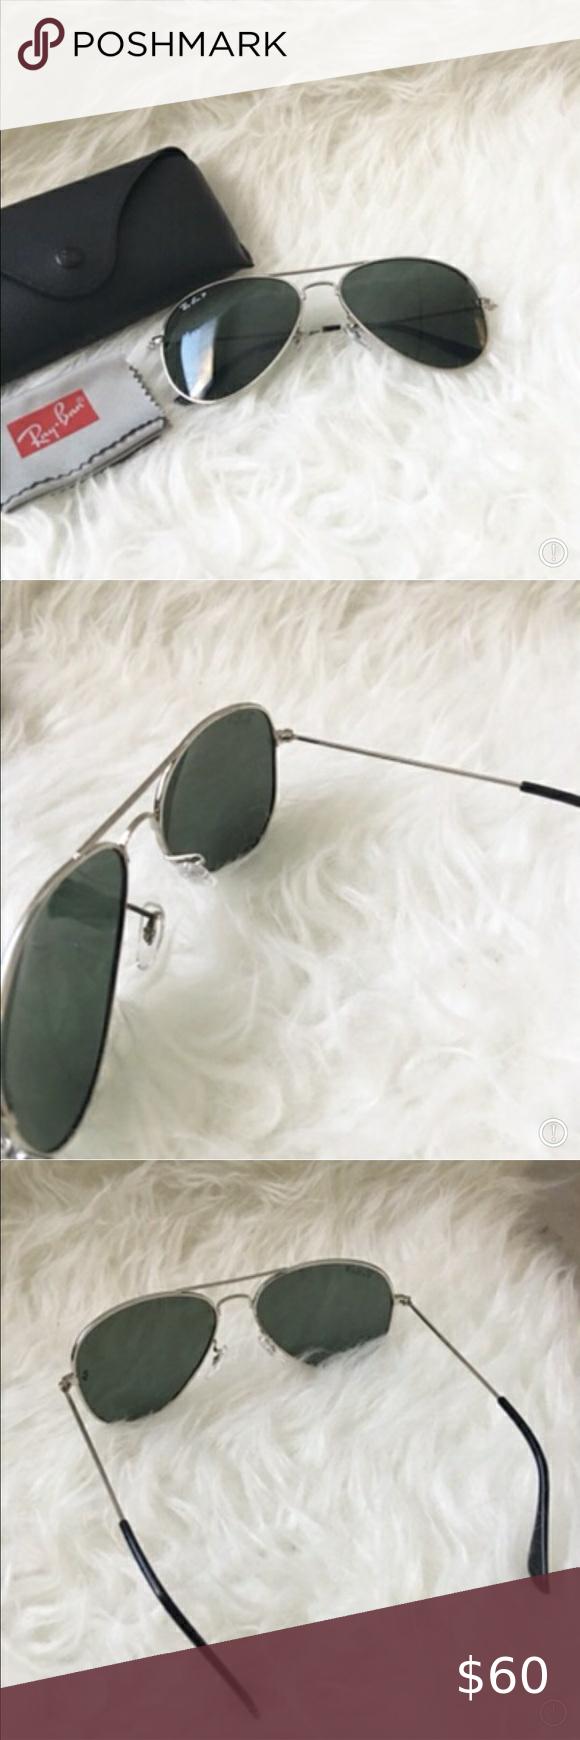 Celebrity Sunglasses Gallery 3 - Ray-Ban Sunglasses